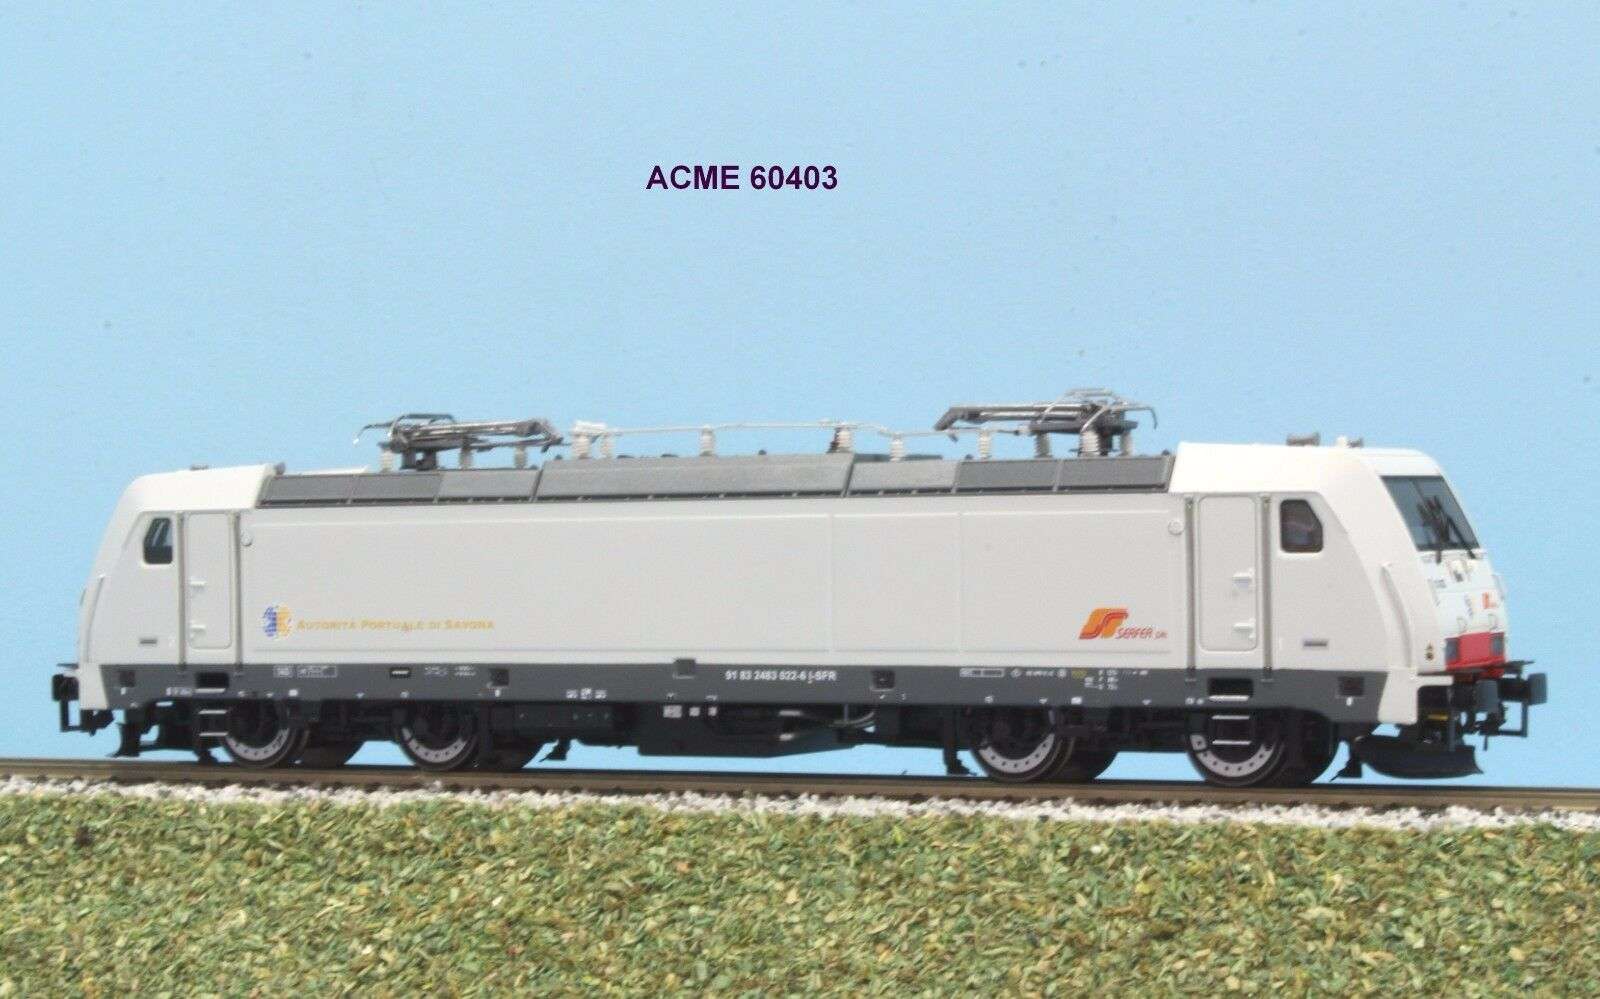 ACME 60403 SERFER locomotiva E 483 Autorità Portuale Savona